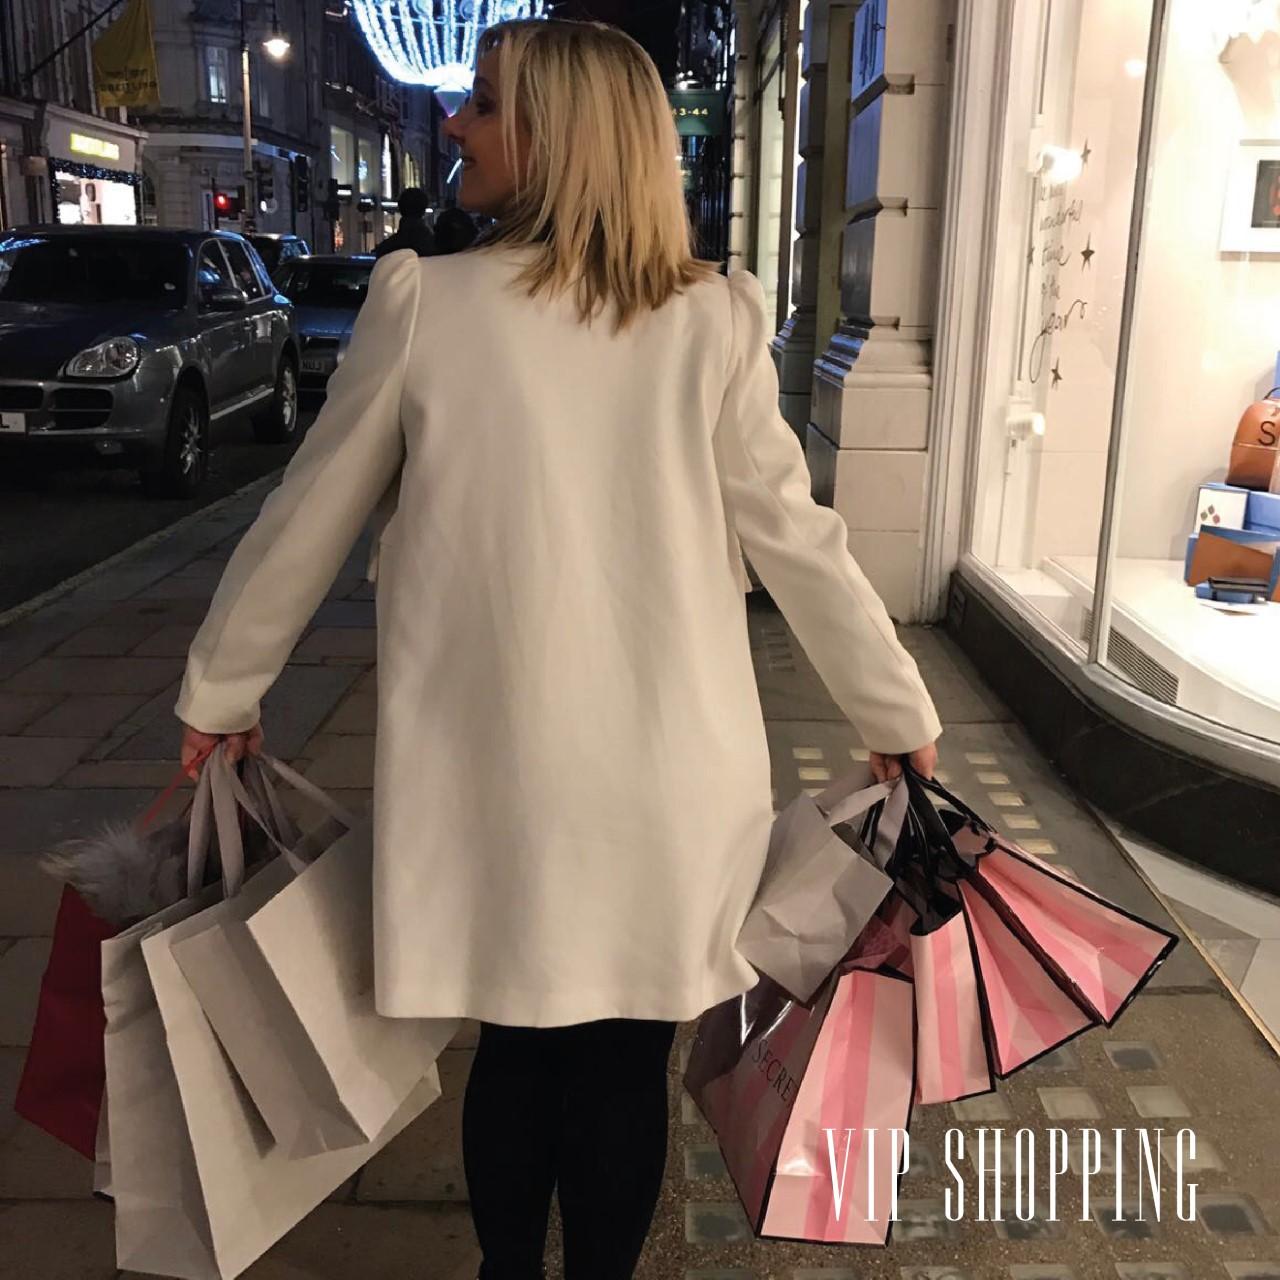 VIP Shopping Days